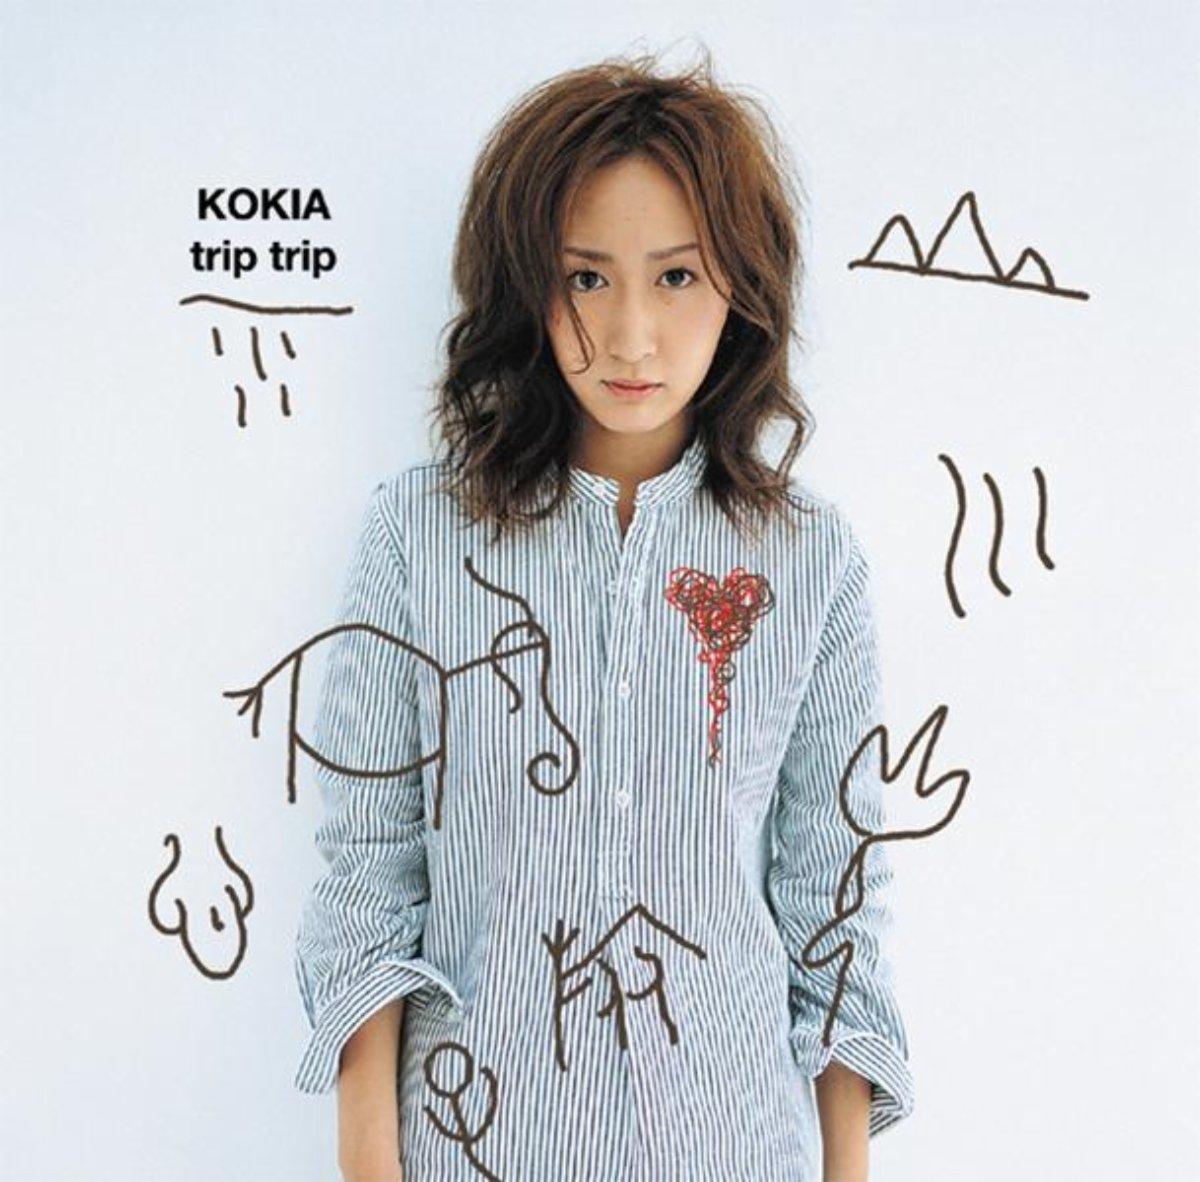 KOKIA – trip trip [FLAC / 24bit Lossless / WEB] [2002.01.23]